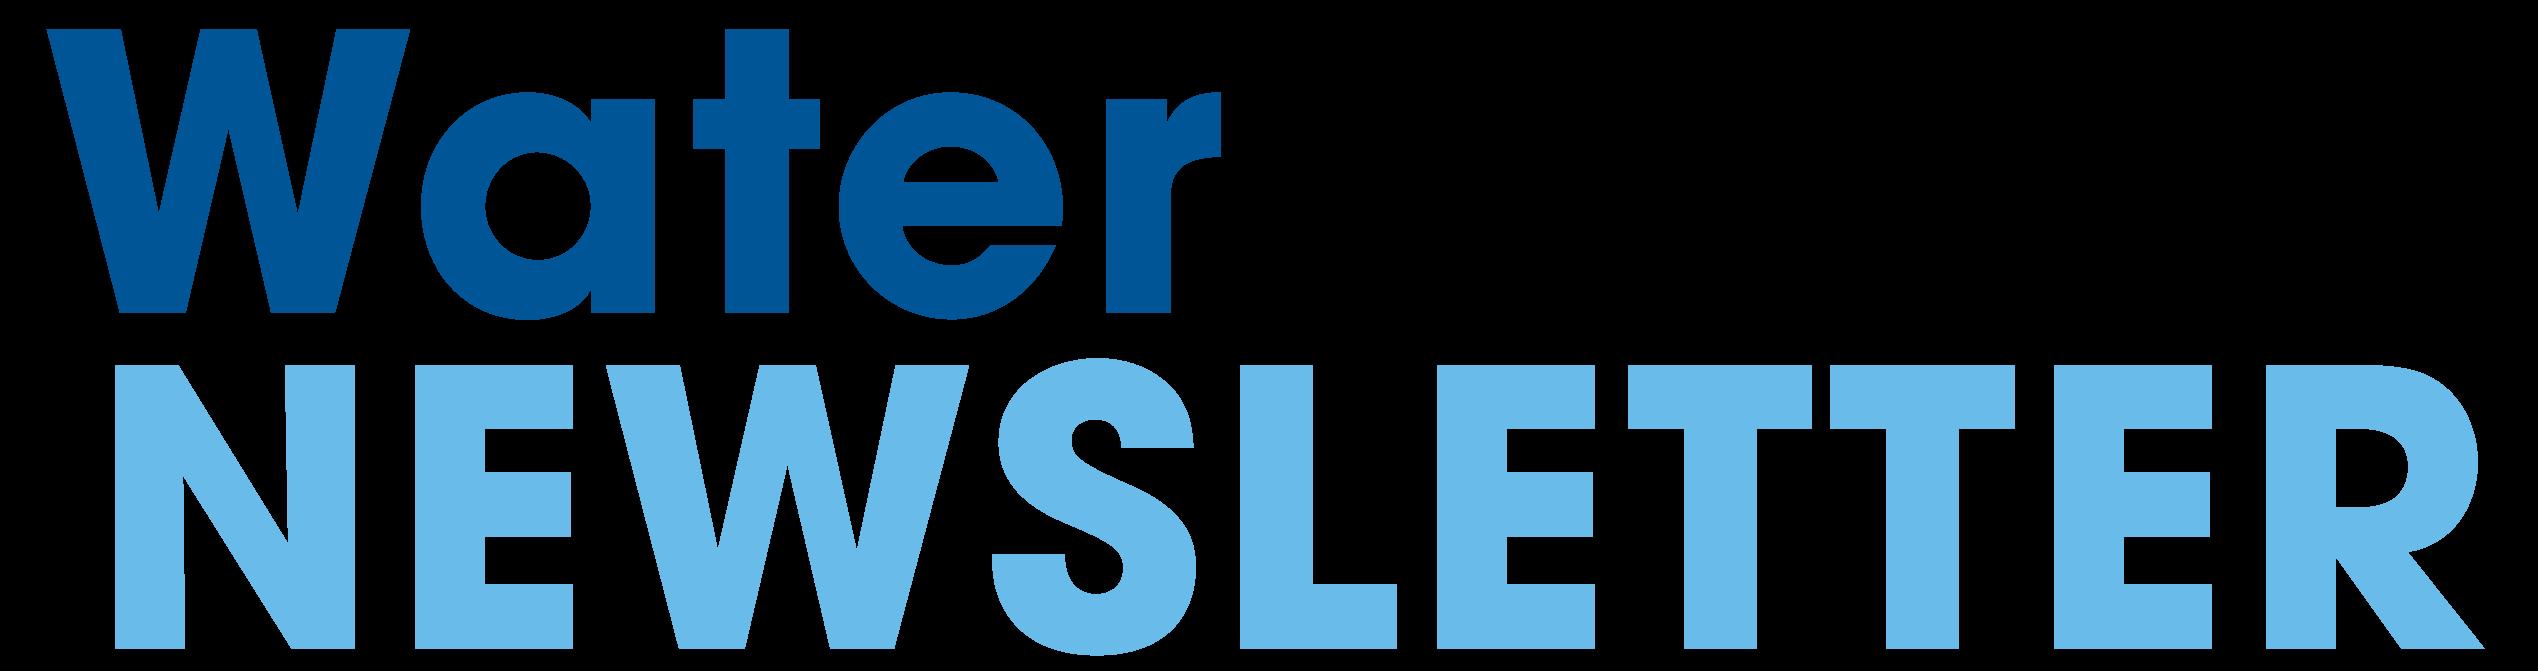 Water Newsletter